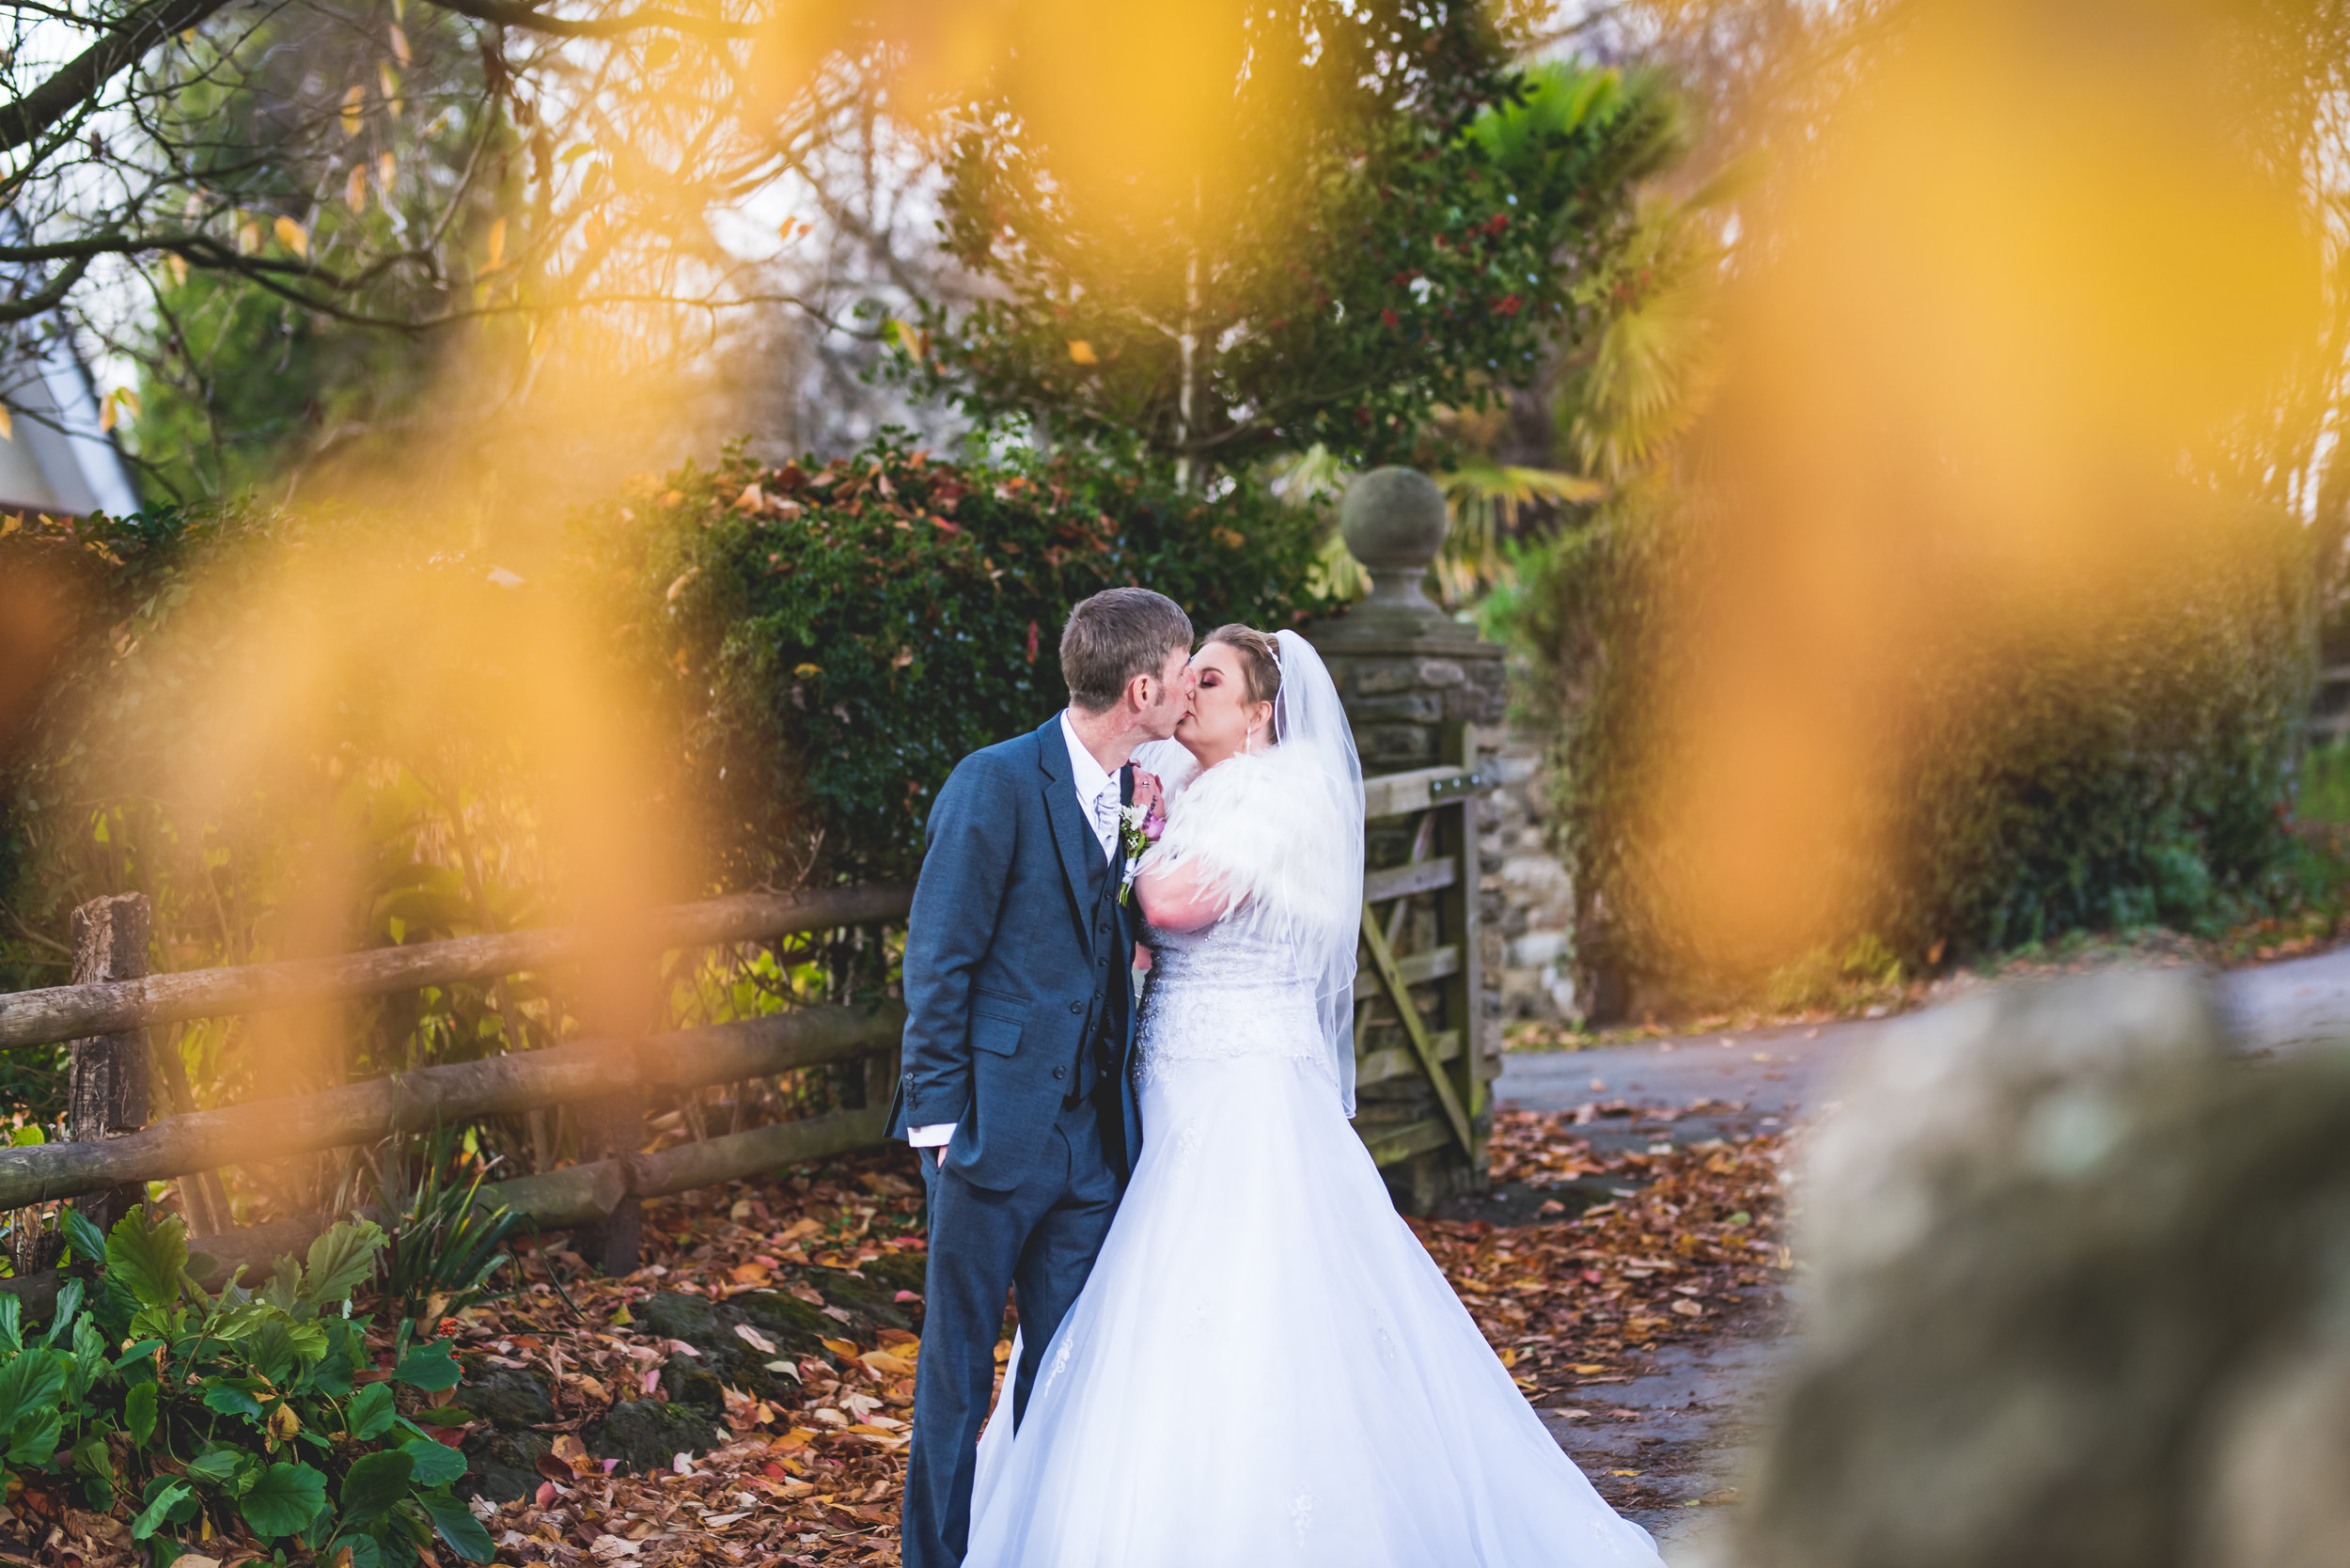 The Old Barn Inn Llanmartin wedding